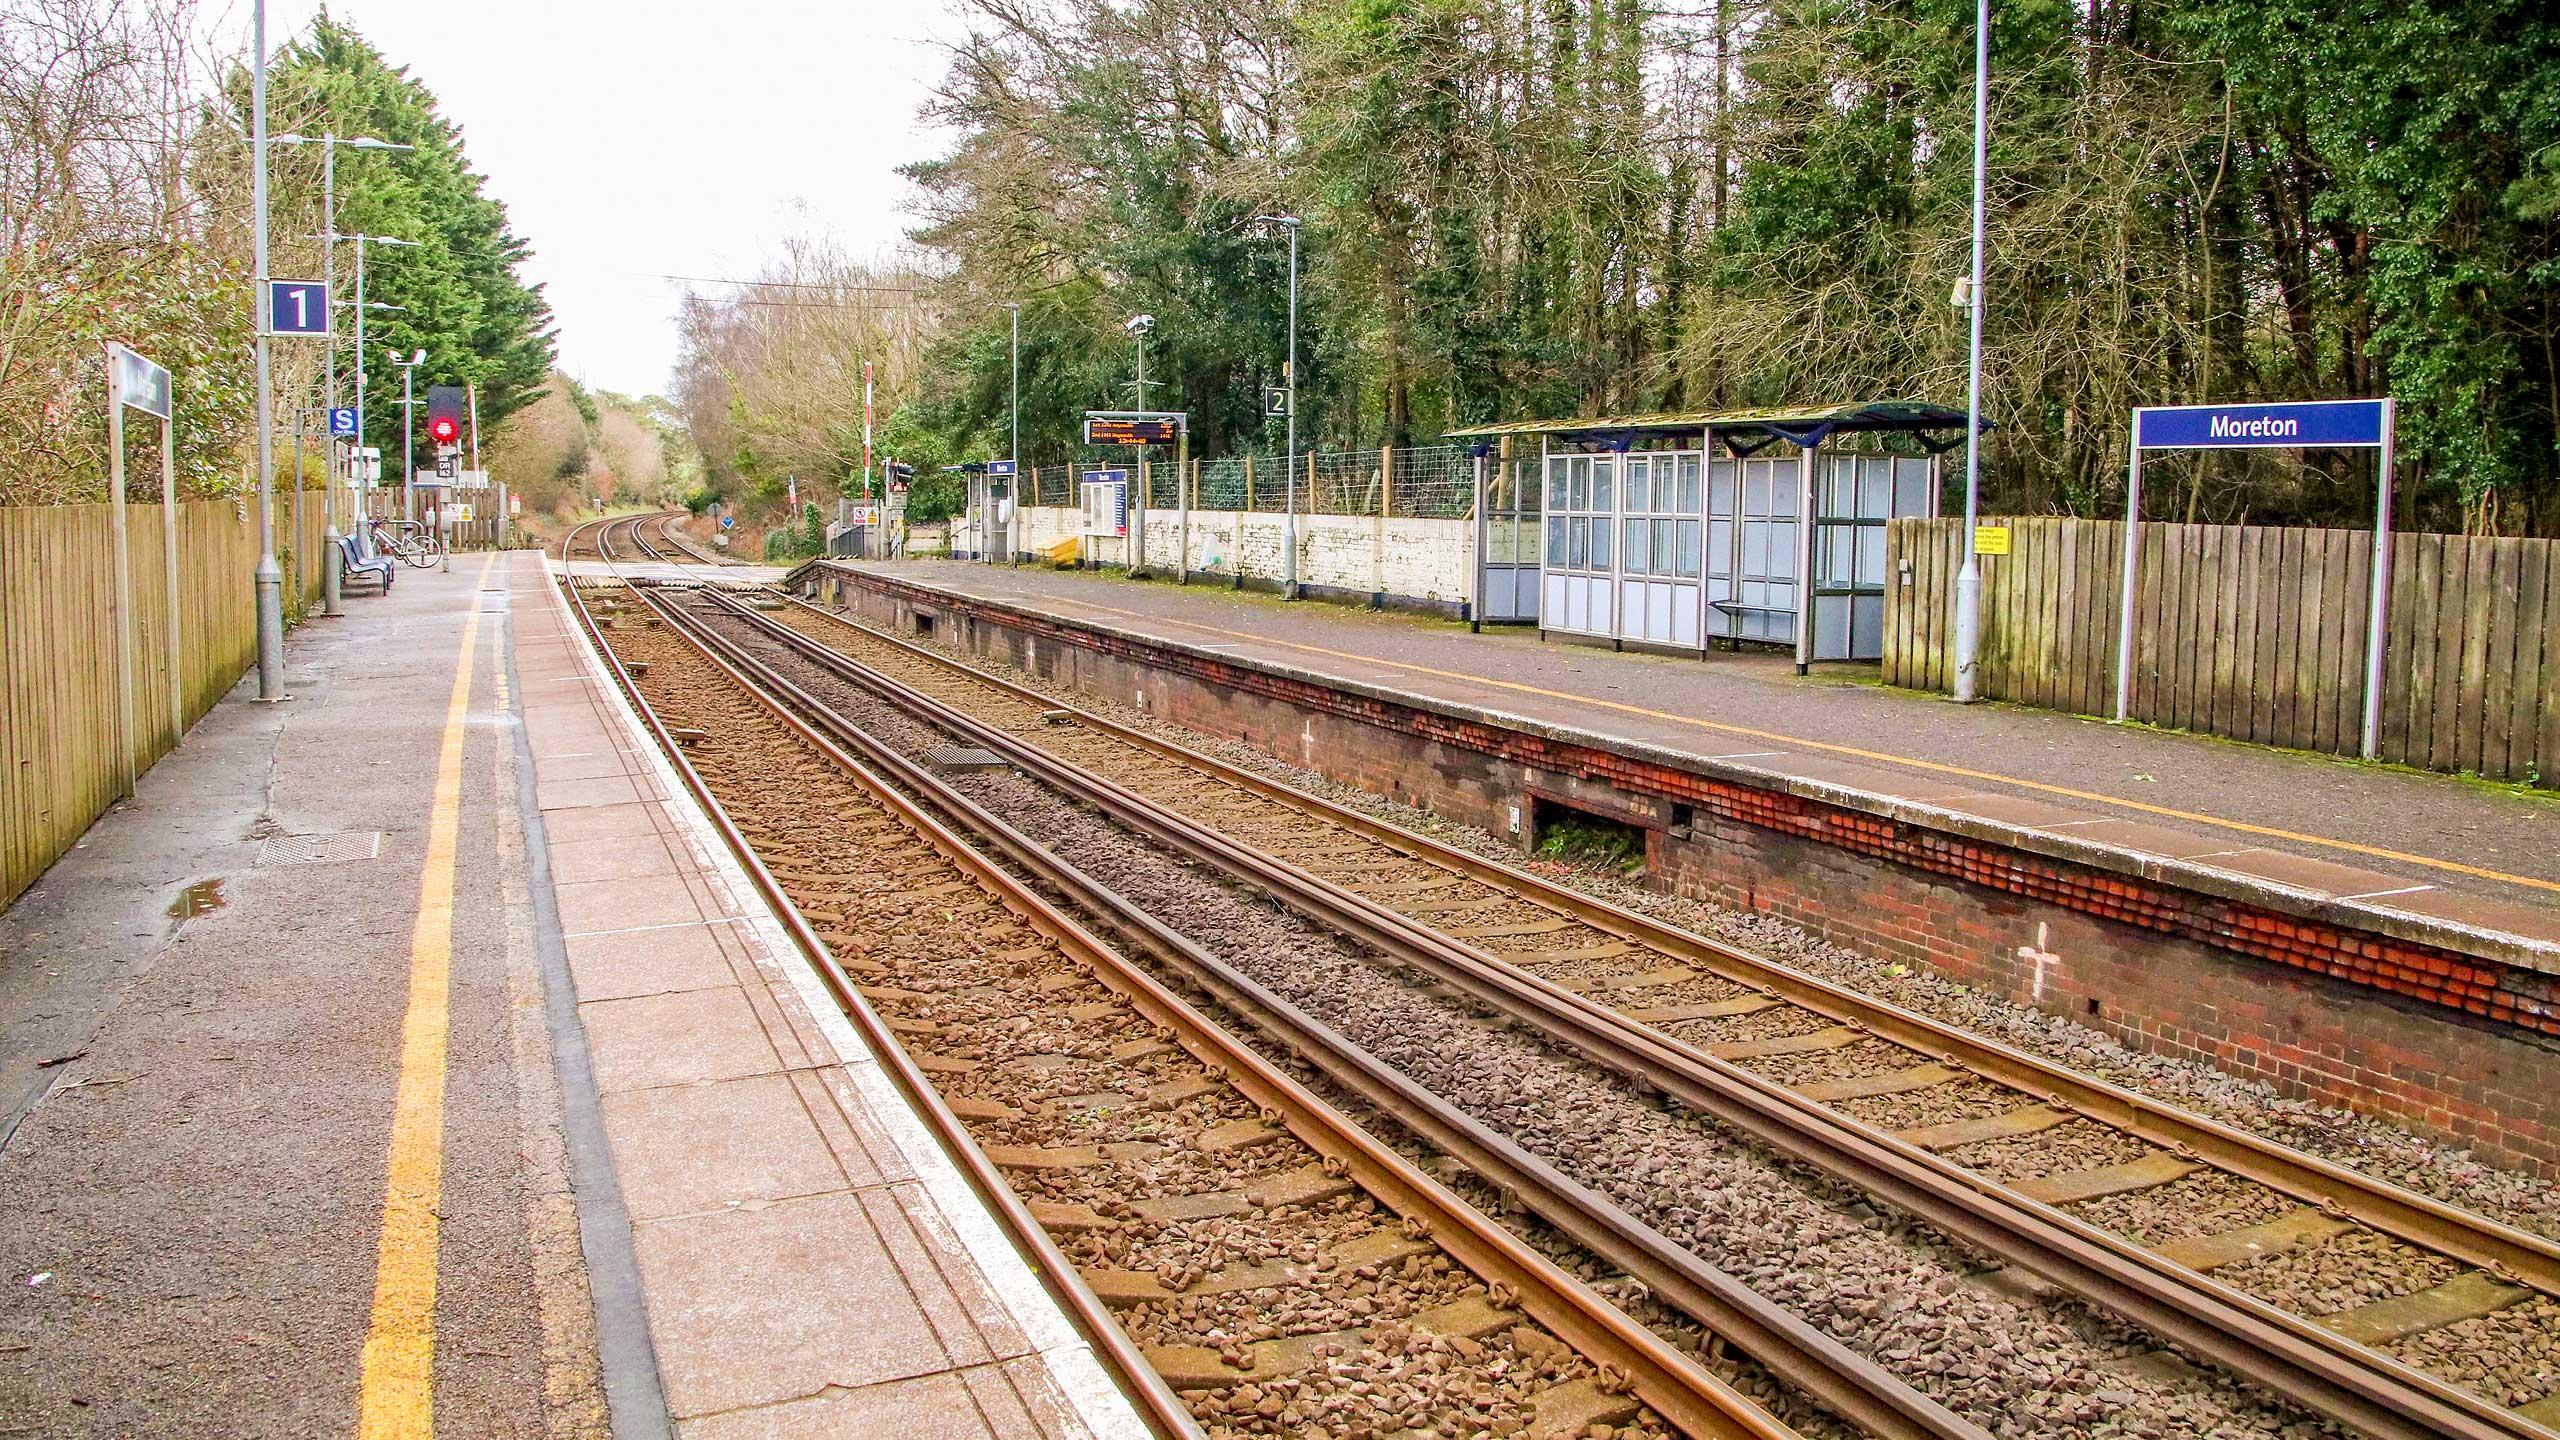 Purbeck Community Rail Partnership Sliding Banner Moreton Railway Station 08 2560x1440px